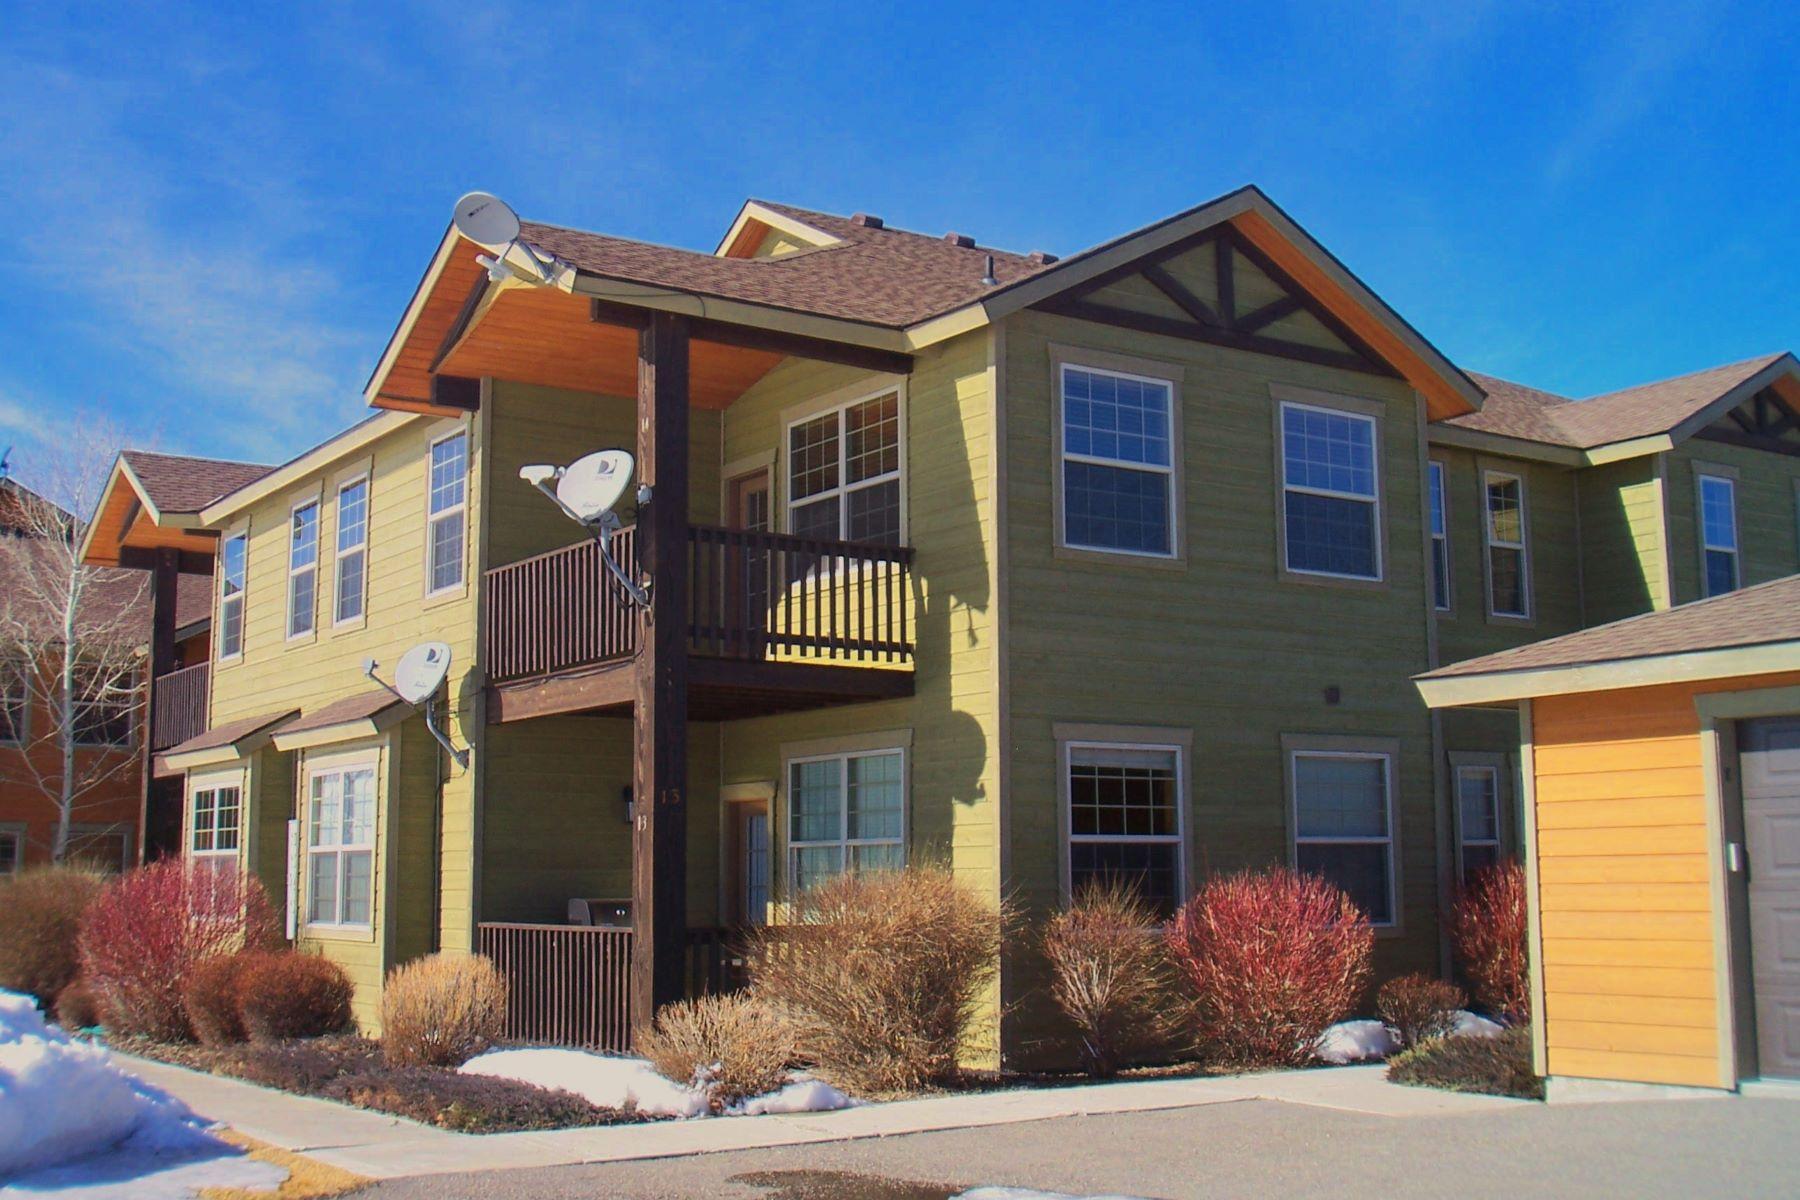 共管式独立产权公寓 为 销售 在 Three bedroom condo - Teton views 633 BUFFALO JUNCTION LOOP UNIT 14 & GARAGE G 德里格斯, 爱达荷州, 83422 Jackson Hole, 美国